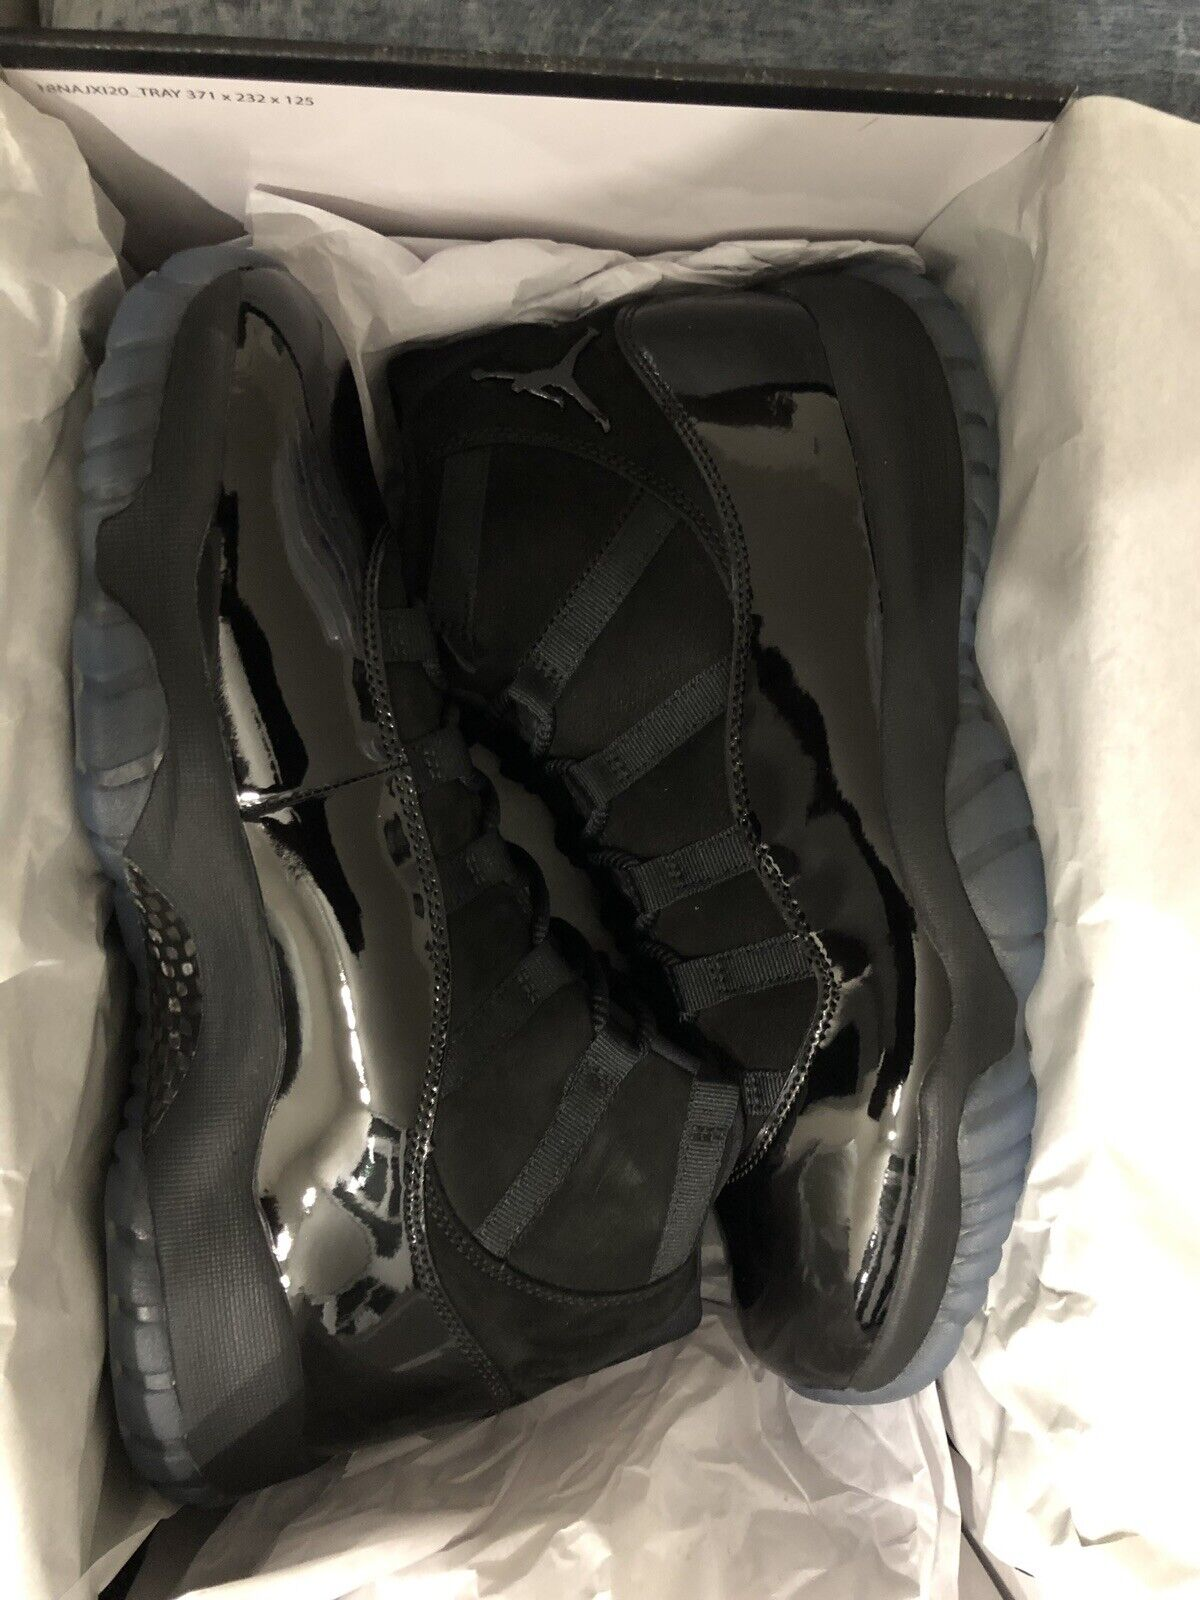 Nike Air Jordan 11 Retro XI Size 11 Black Black Black 378037 005 Cap and Gown